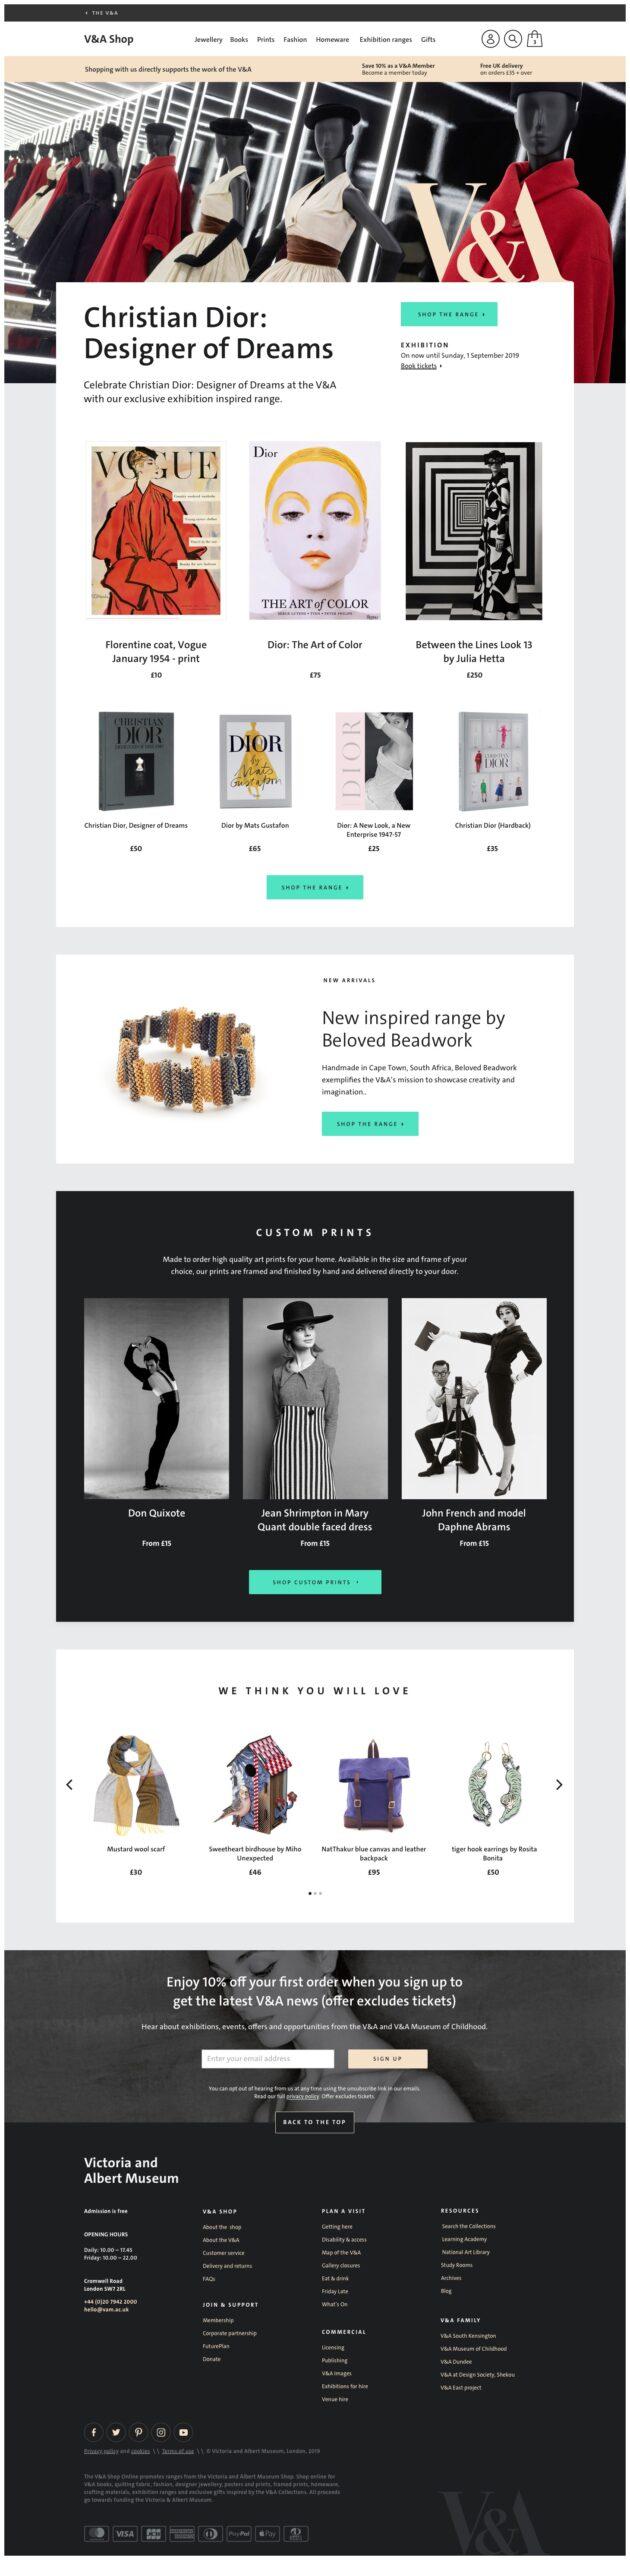 VA-Homepage-Christian-Dior